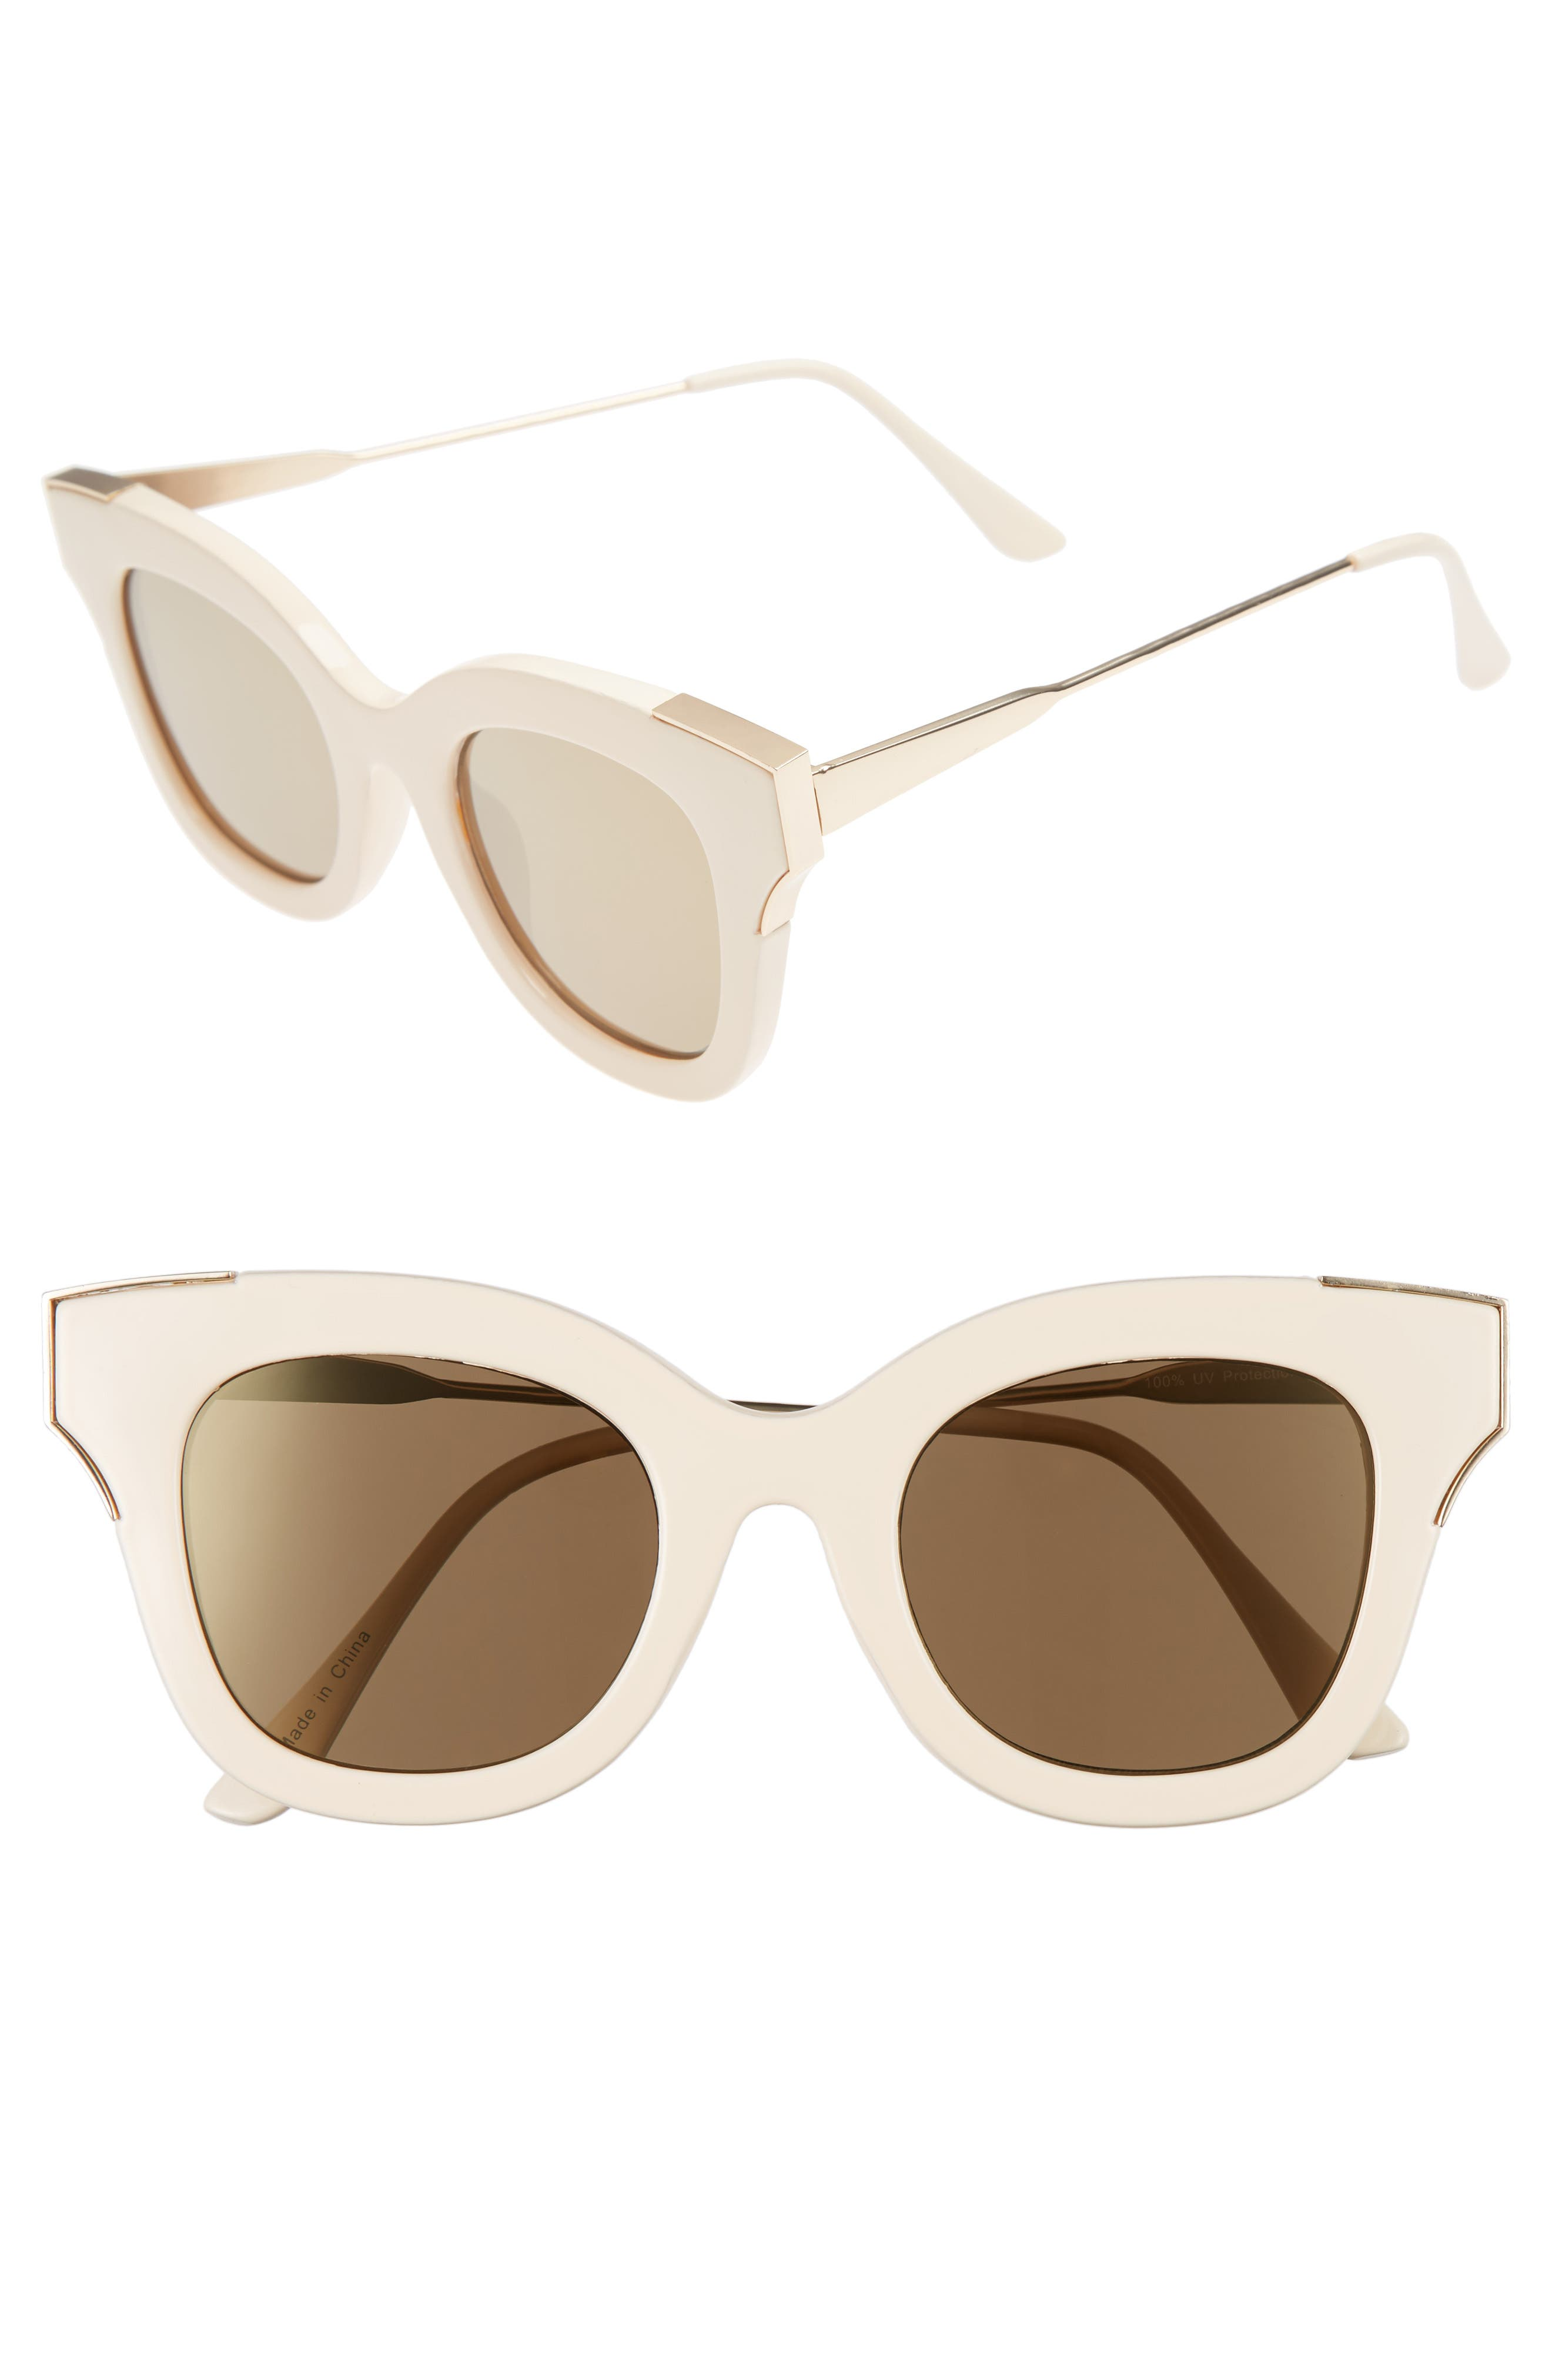 Alternate Image 1 Selected - BP. 50mm Cat Eye Sunglasses